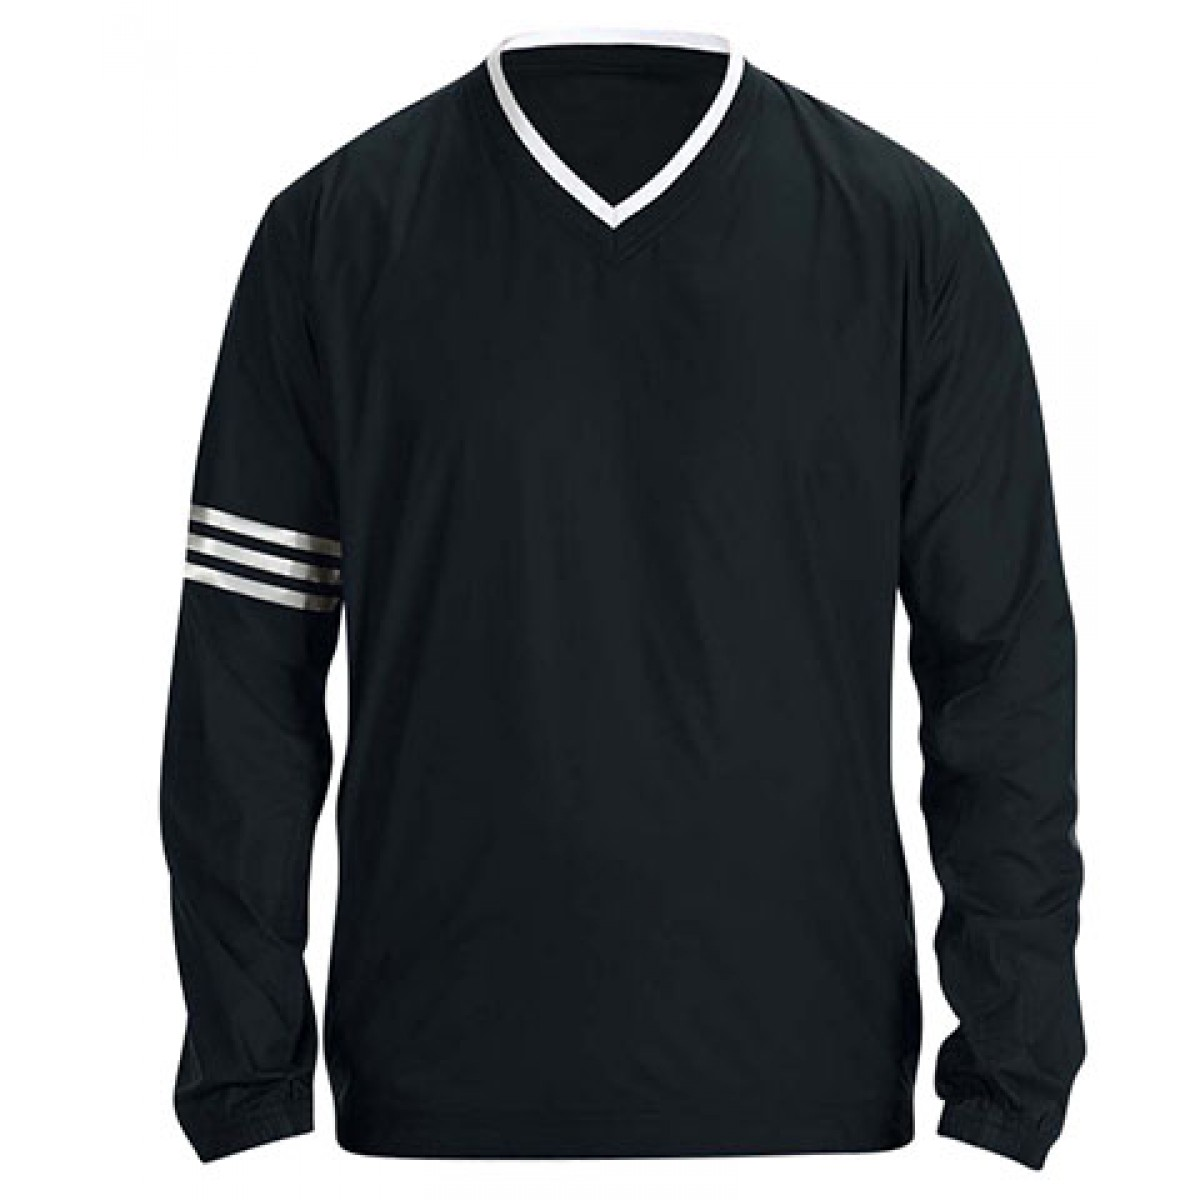 Adidas ClimaLite V-Neck Long Sleeve Wind Shirt-Black-3XL